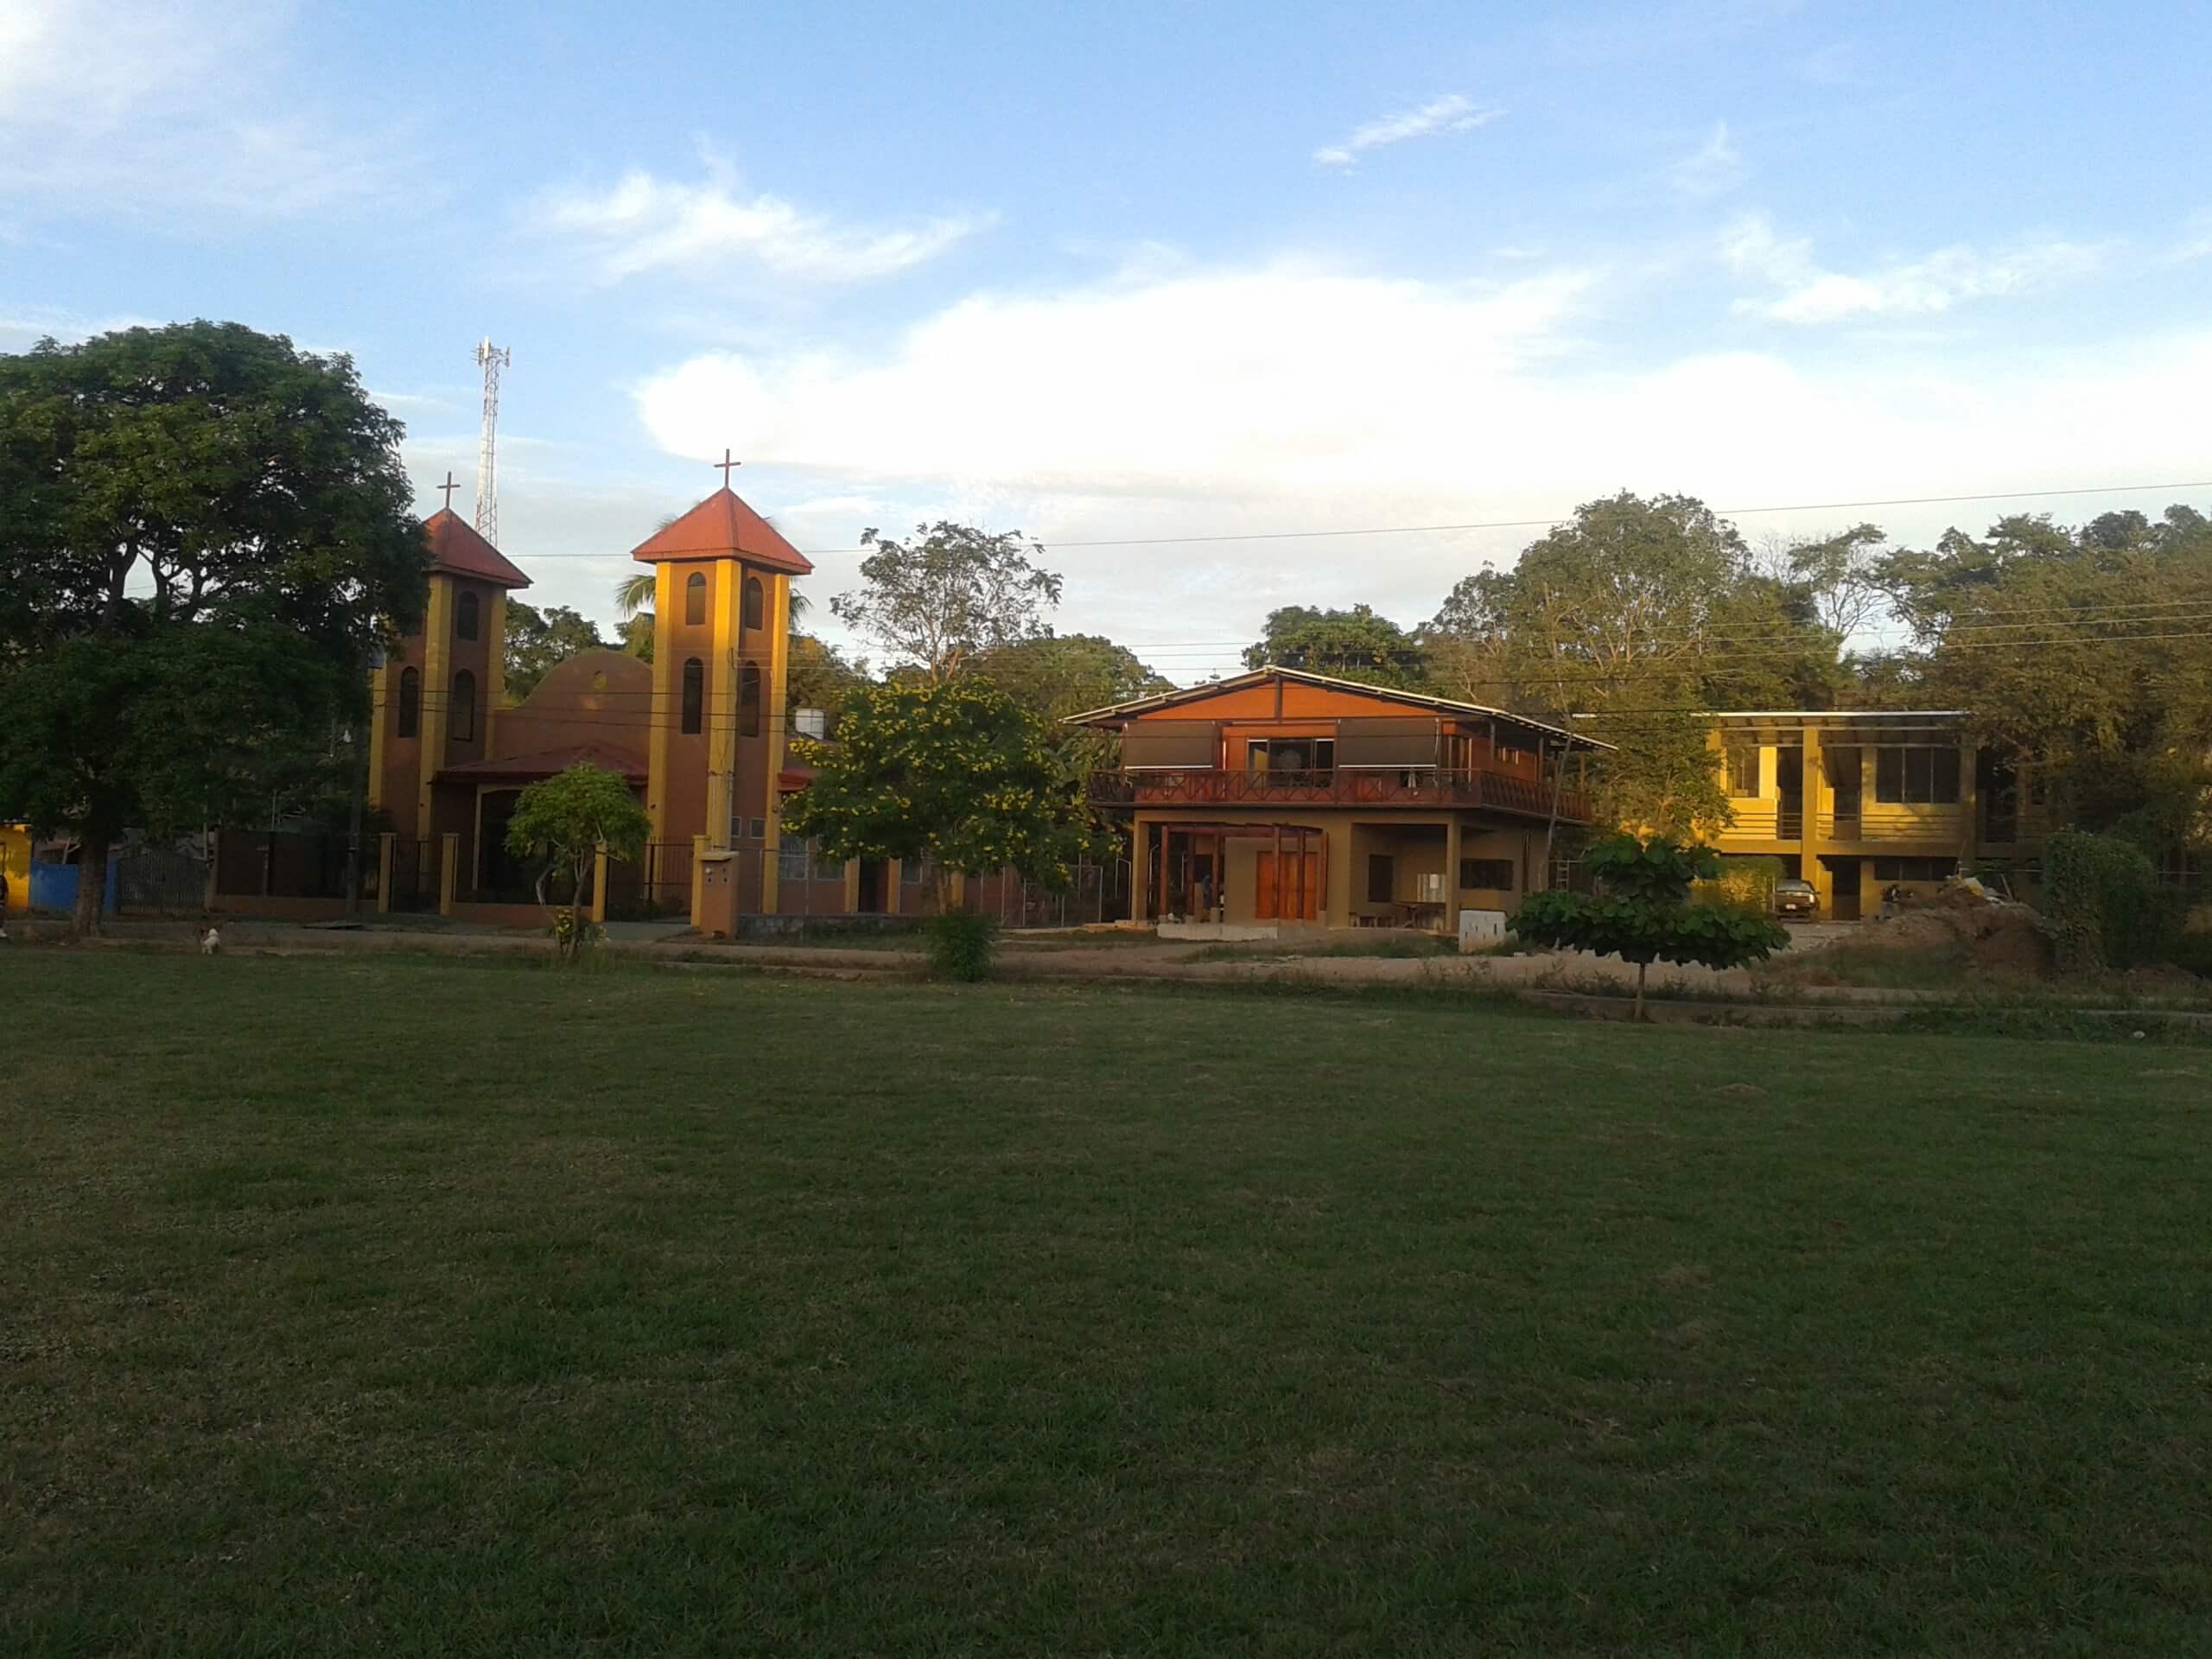 Costa Rica - church. nuns house and high school